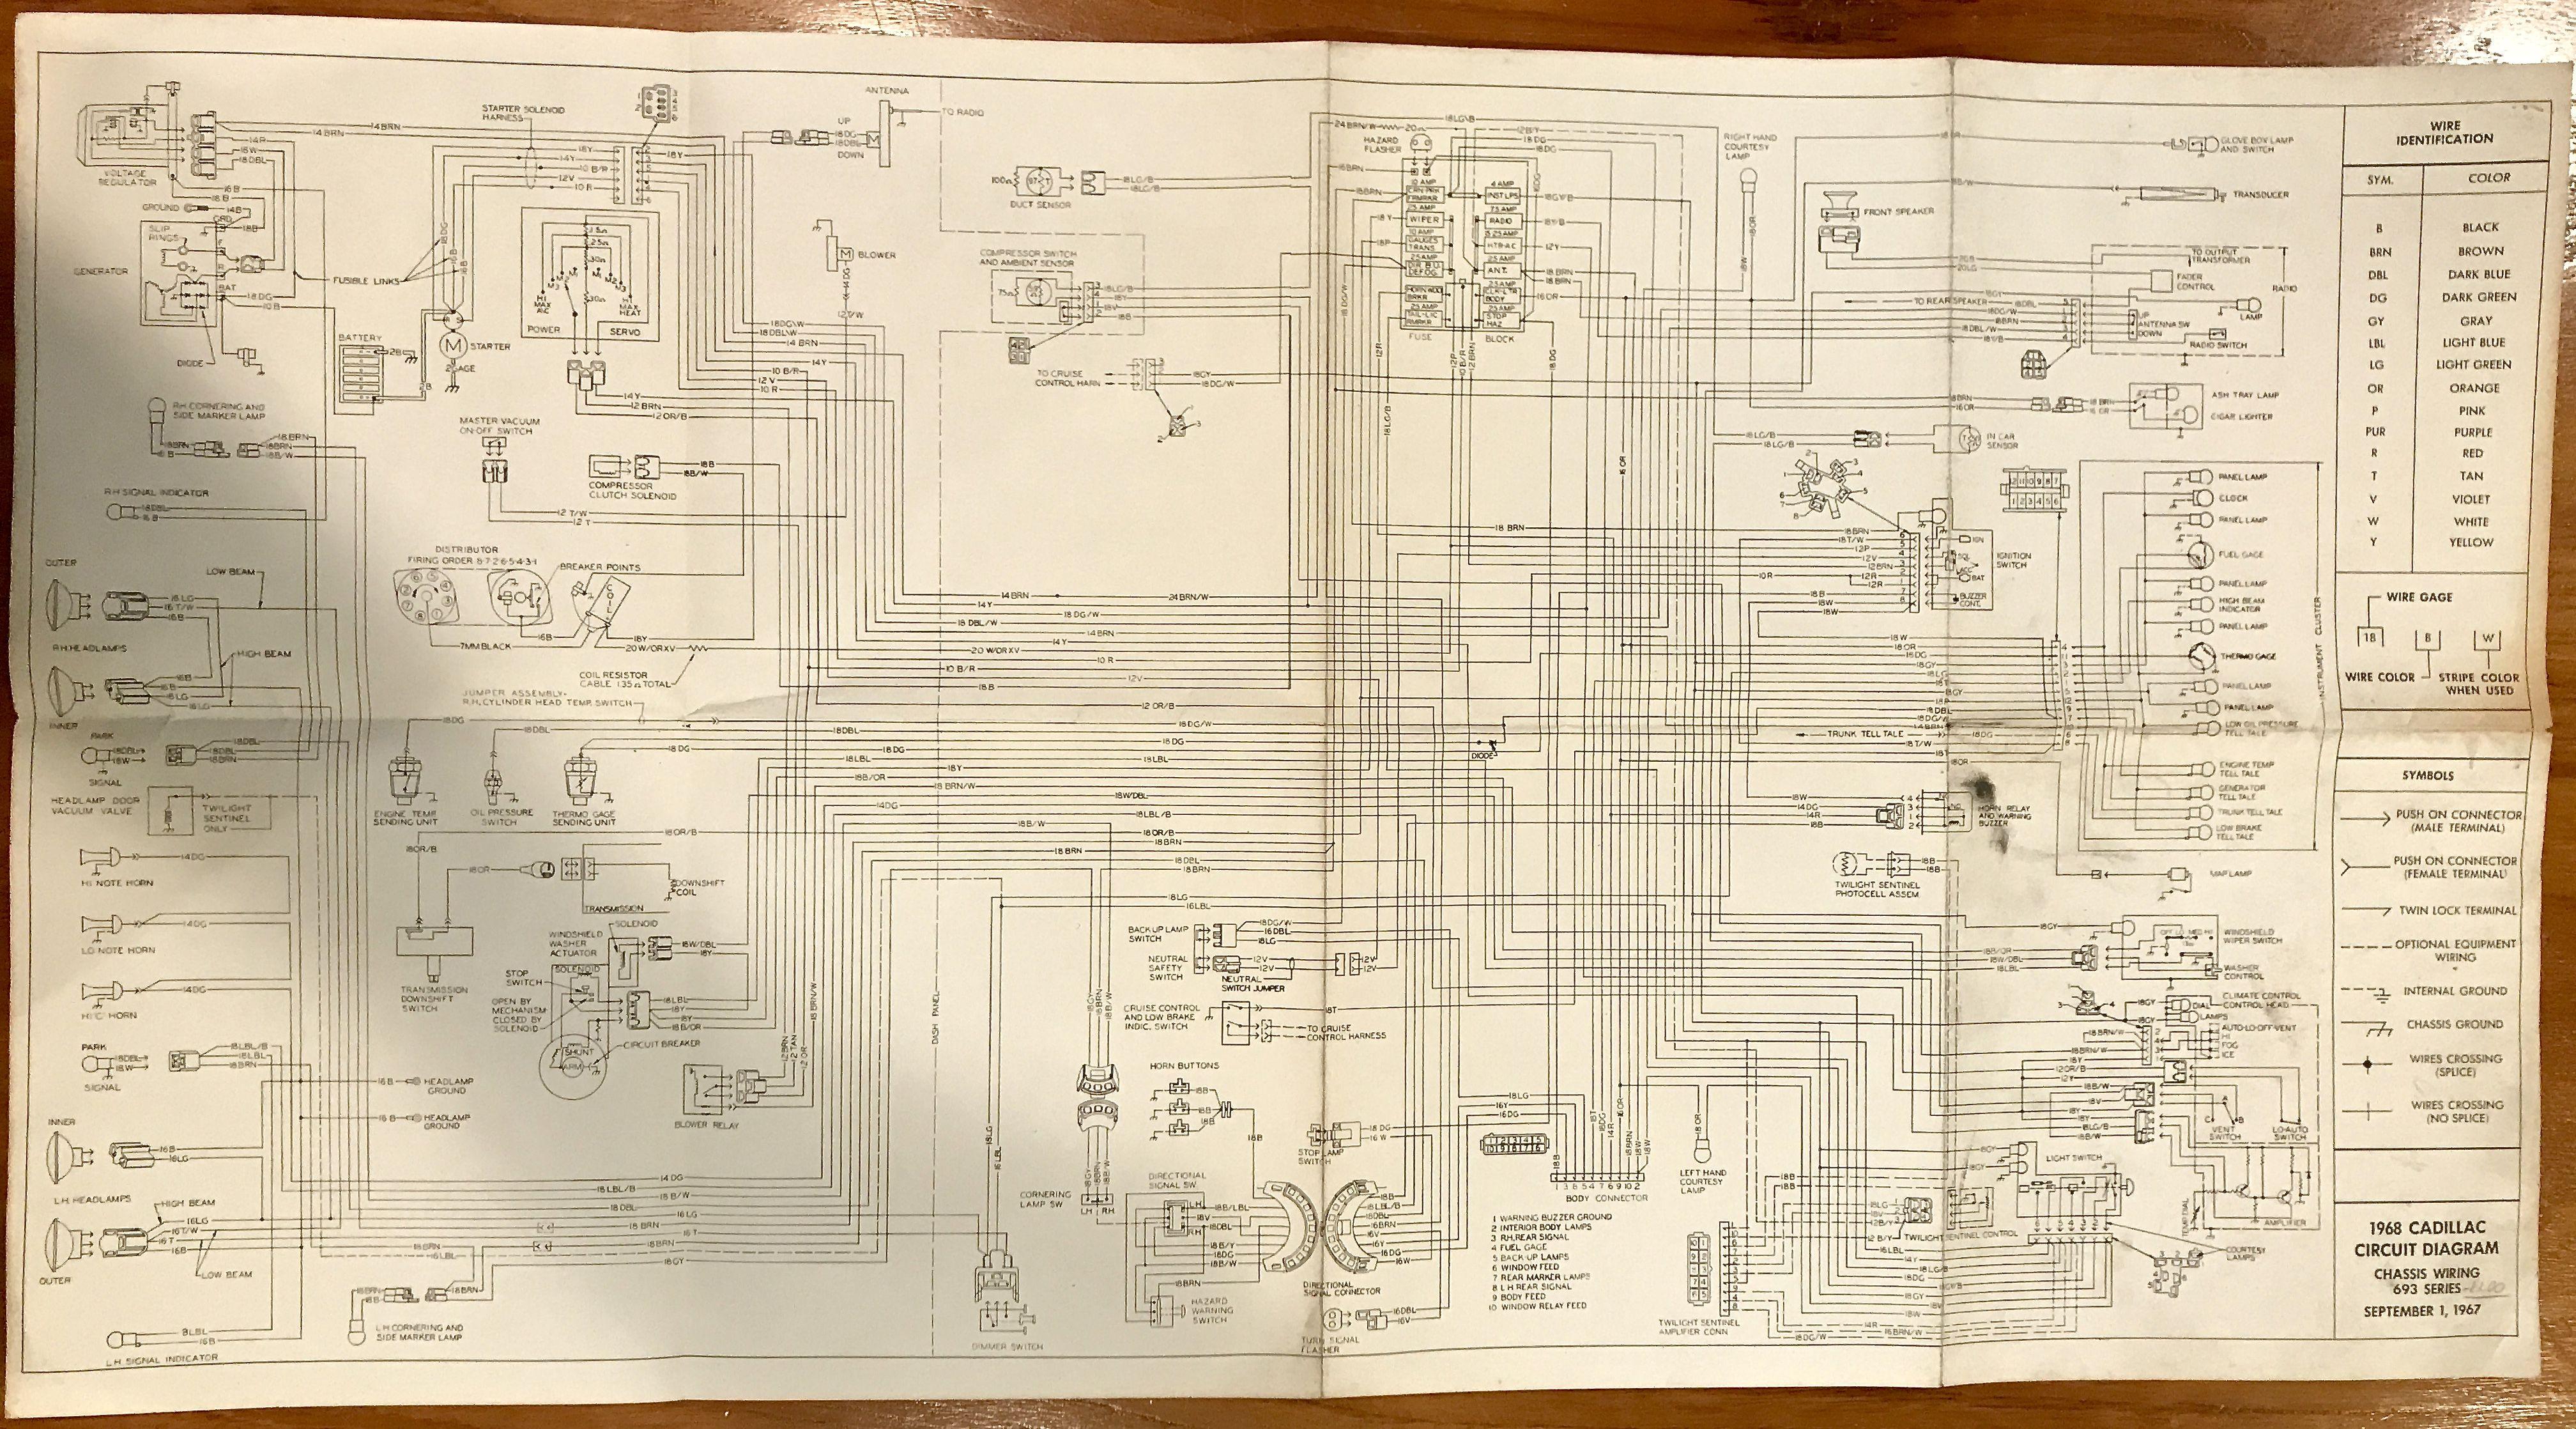 1968 cadillac deville wiring diagram wiring diagram sample 1968 cadillac deville wiring wiring diagram completed 1968 [ 4032 x 2236 Pixel ]